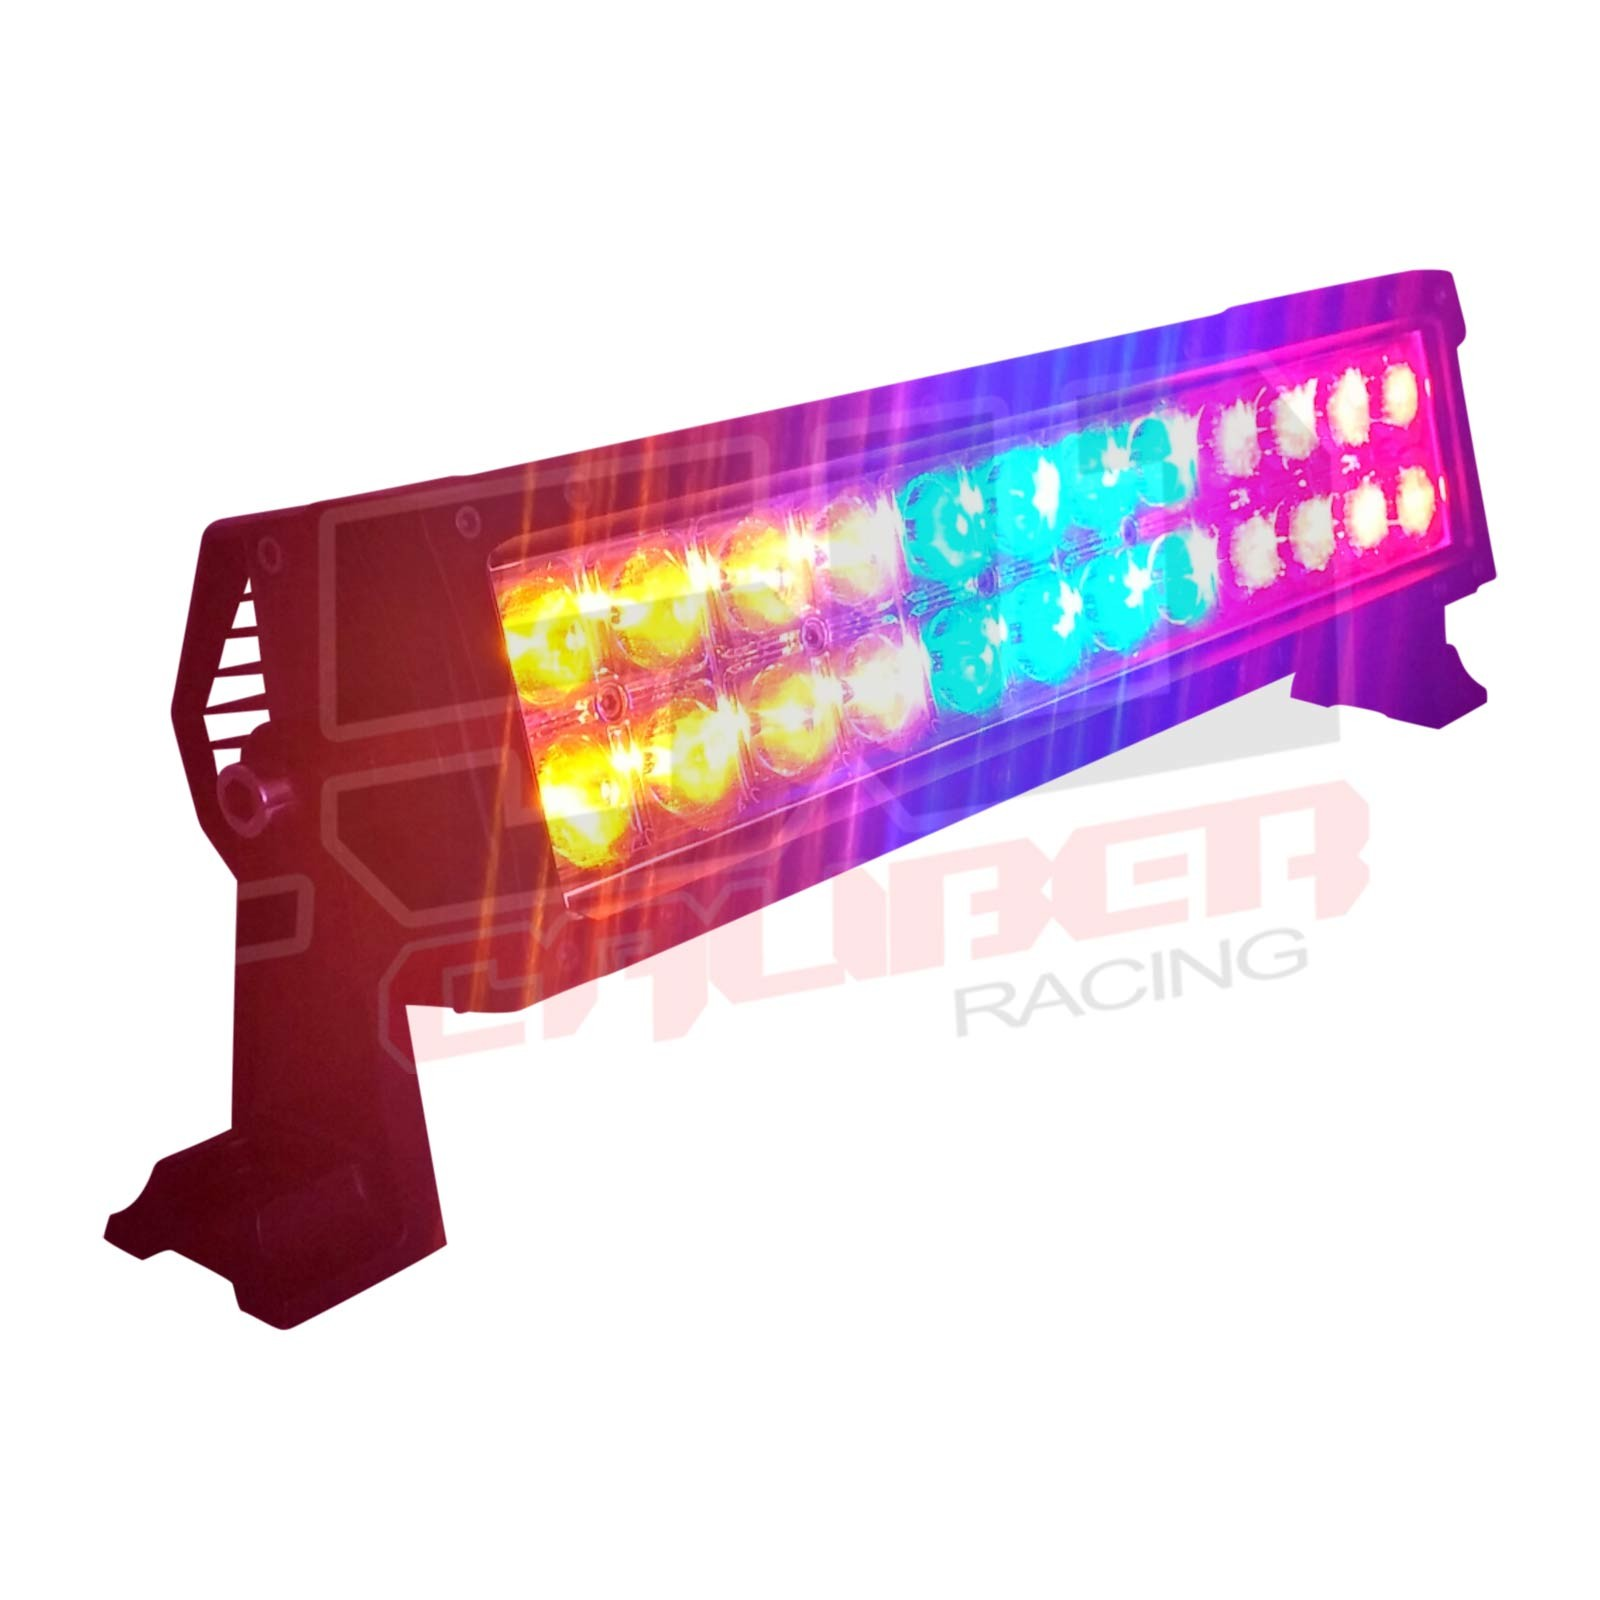 Rocker switch zombie lights led light bars amp off road lighting - 12 Inch Multicolor Led Light Bar With